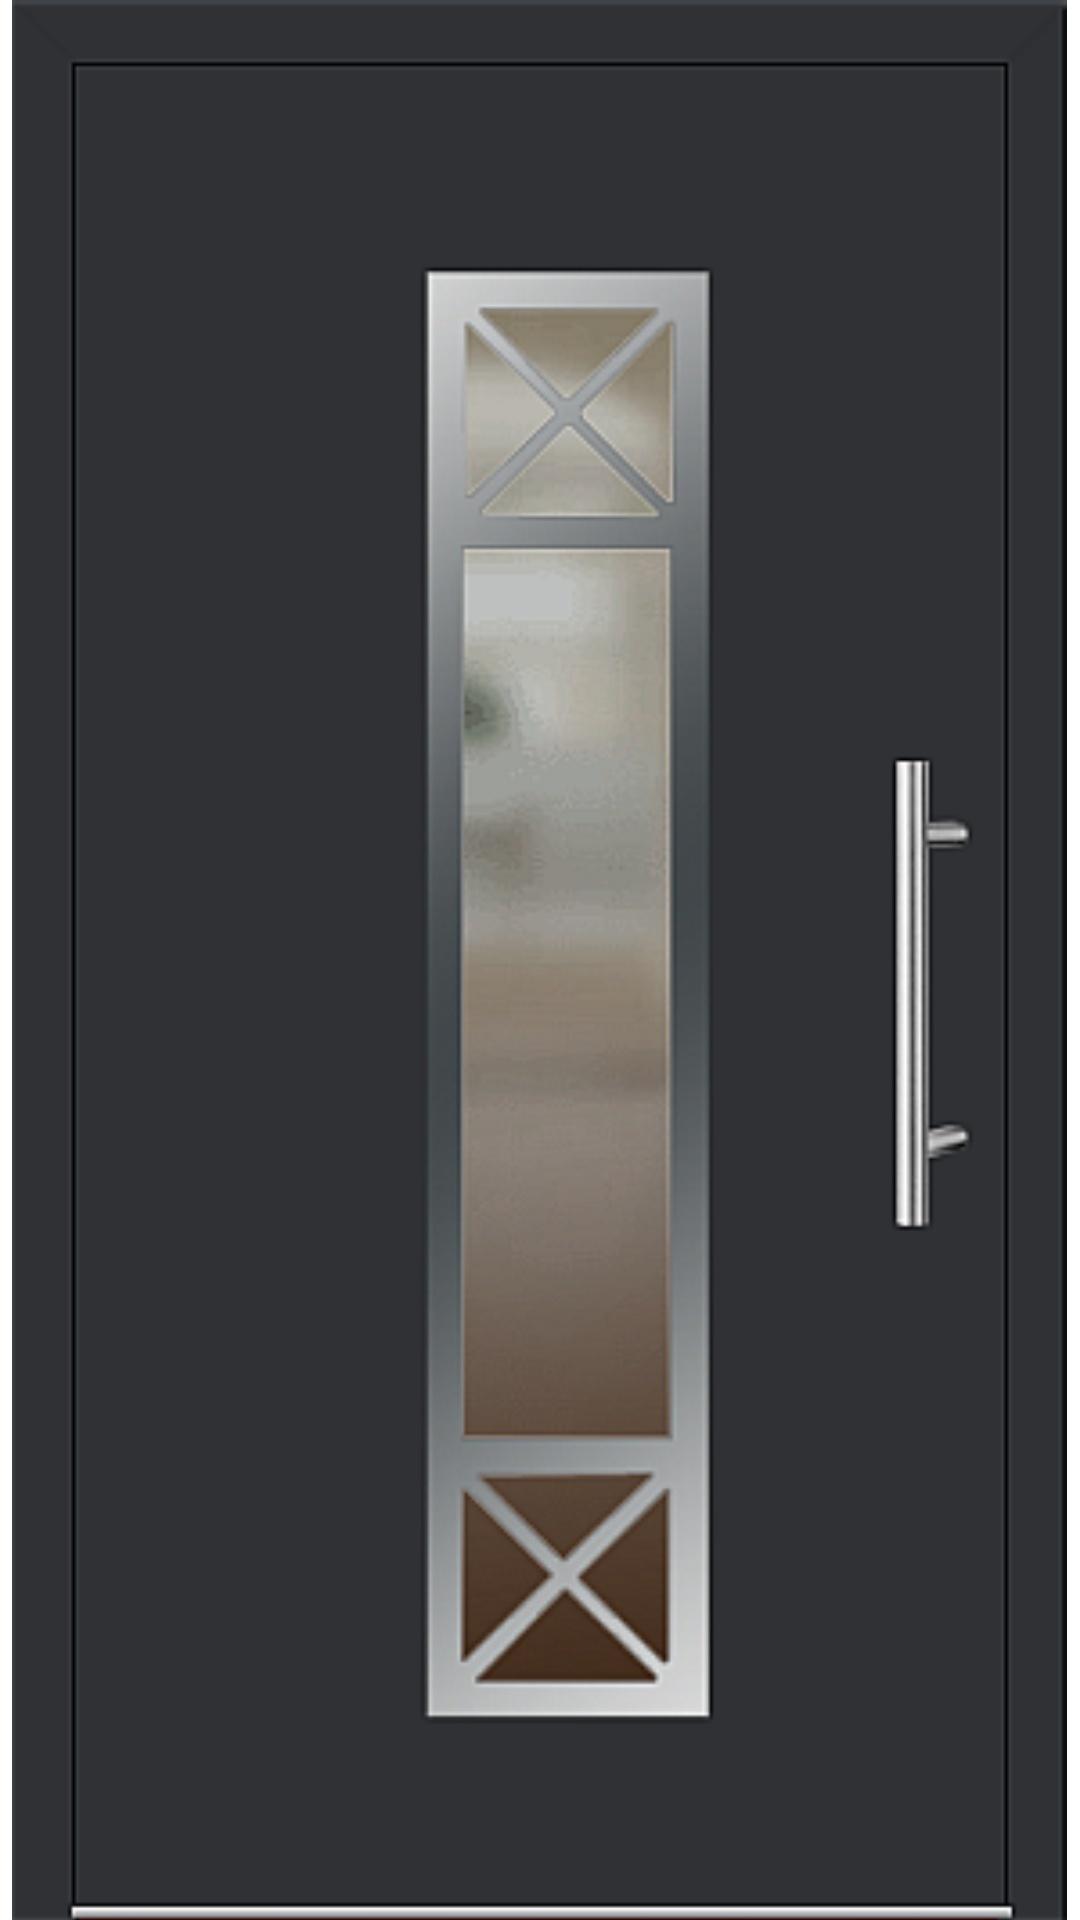 Aluminium Haustür Modell 186-75 schwarz